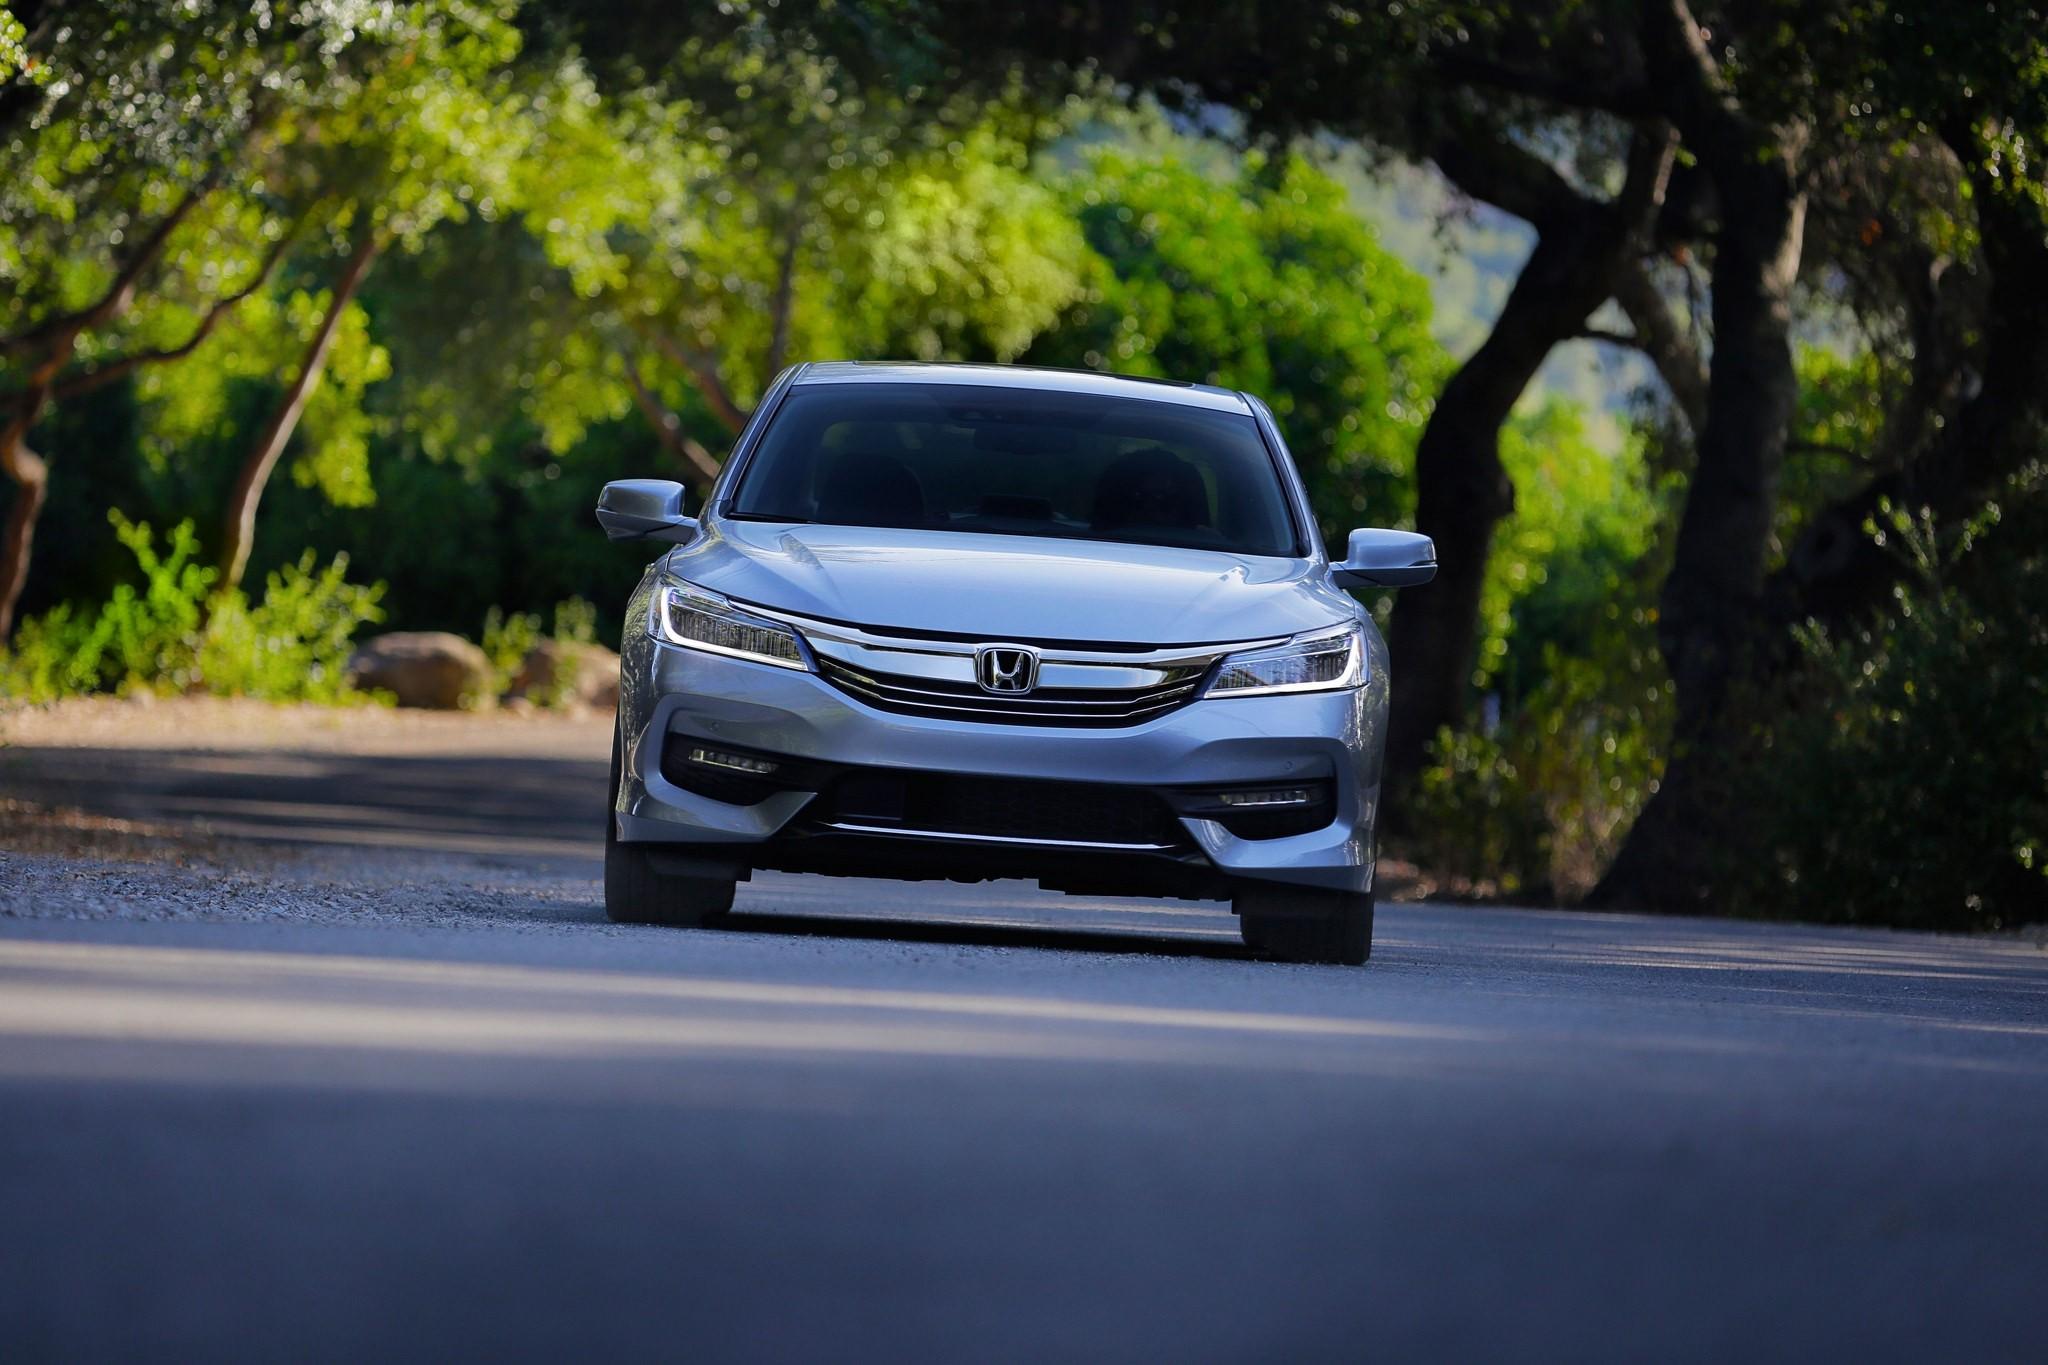 2016 Honda Accord Sedan Model Overview in Fletcher, NC